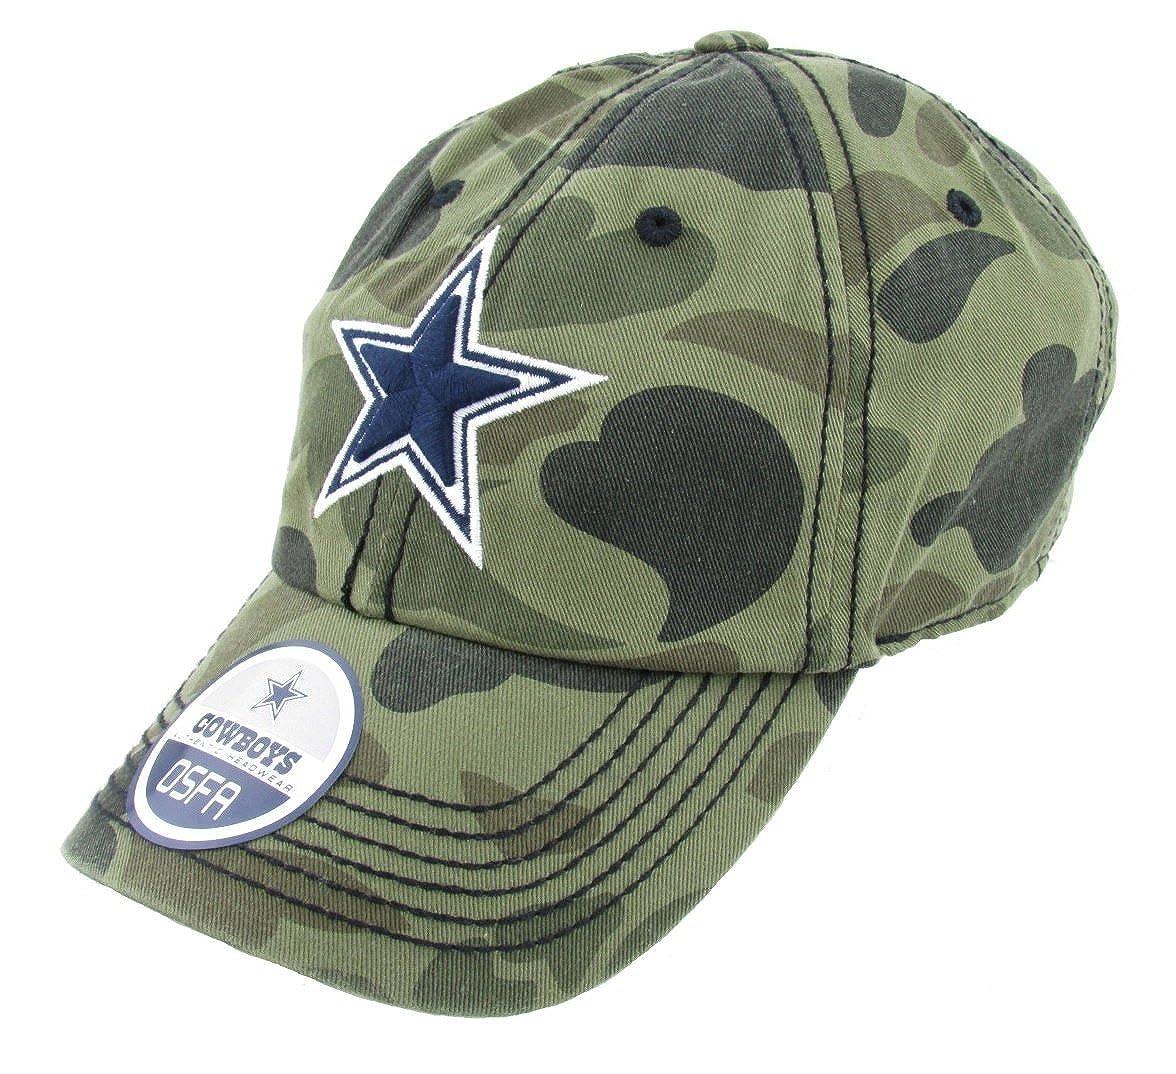 8f02529904b Men s Dallas Cowboys Camolocity Cap Camouflage Size One Size  Amazon.co.uk   Clothing